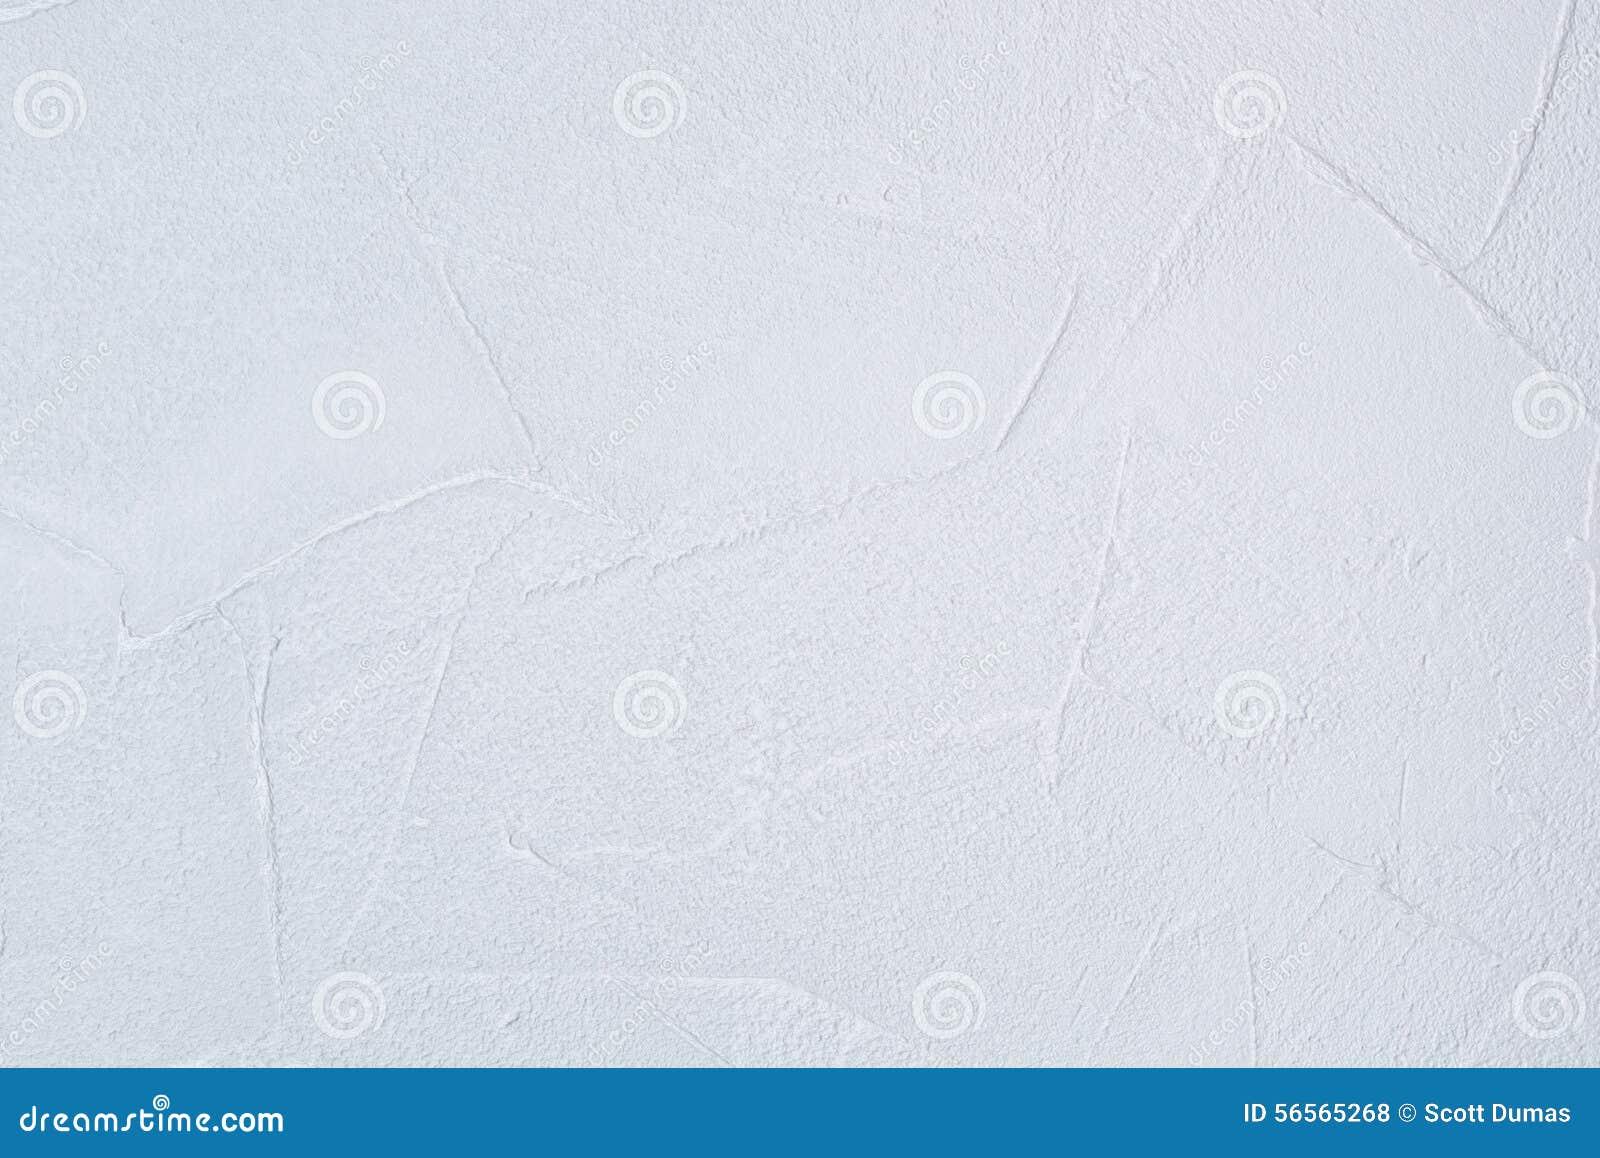 Download Άσπρη ταπετσαρία ασβεστοκονιάματος Στοκ Εικόνες - εικόνα από λεπτομέρεια, ανασκόπησης: 56565268